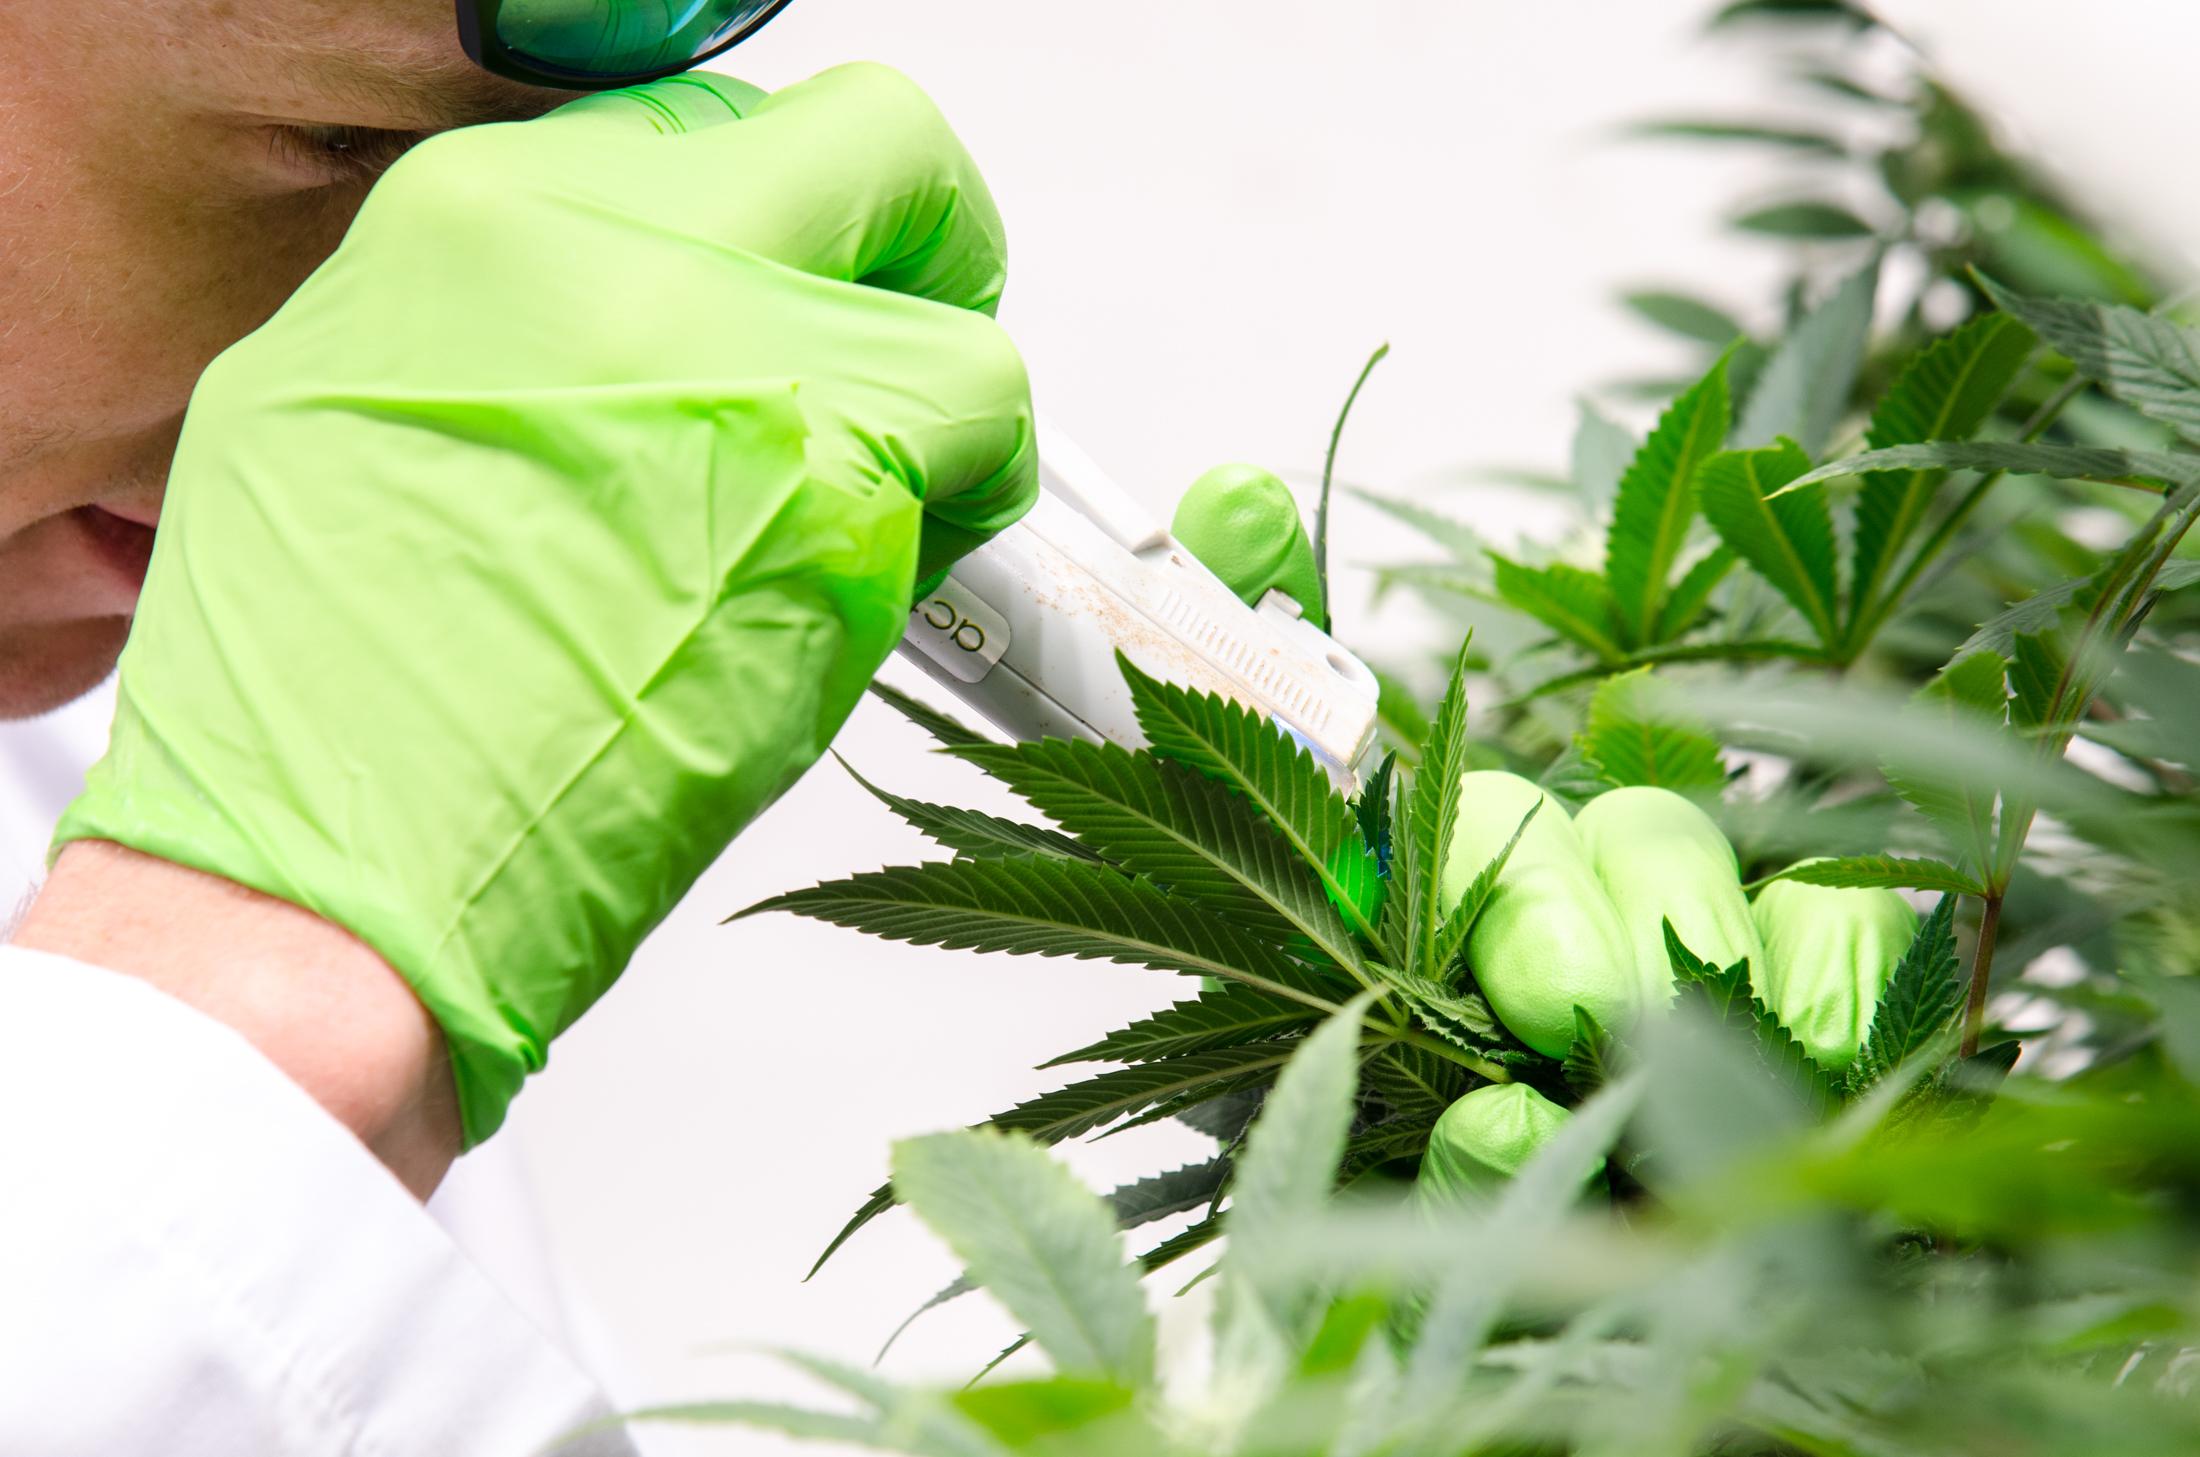 marijuana, dispensary, dispensaries, medical marijuana, marijuana as medicine, marijuana side effects, health